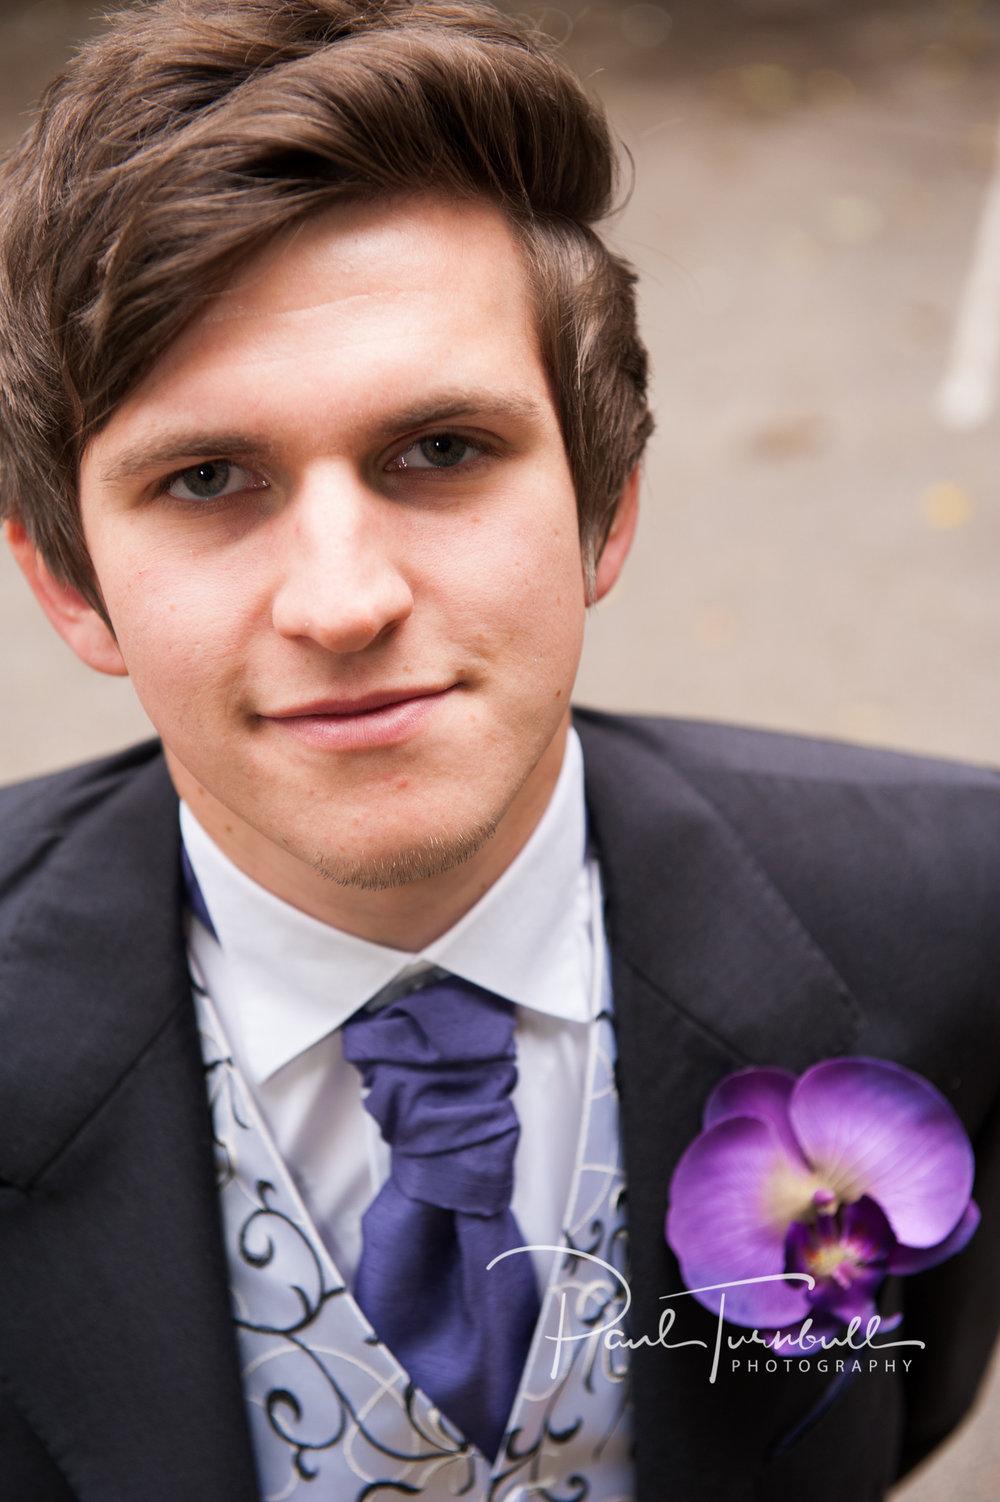 wedding-photography-healds-hall-liversedge-yorkshire-026.jpg